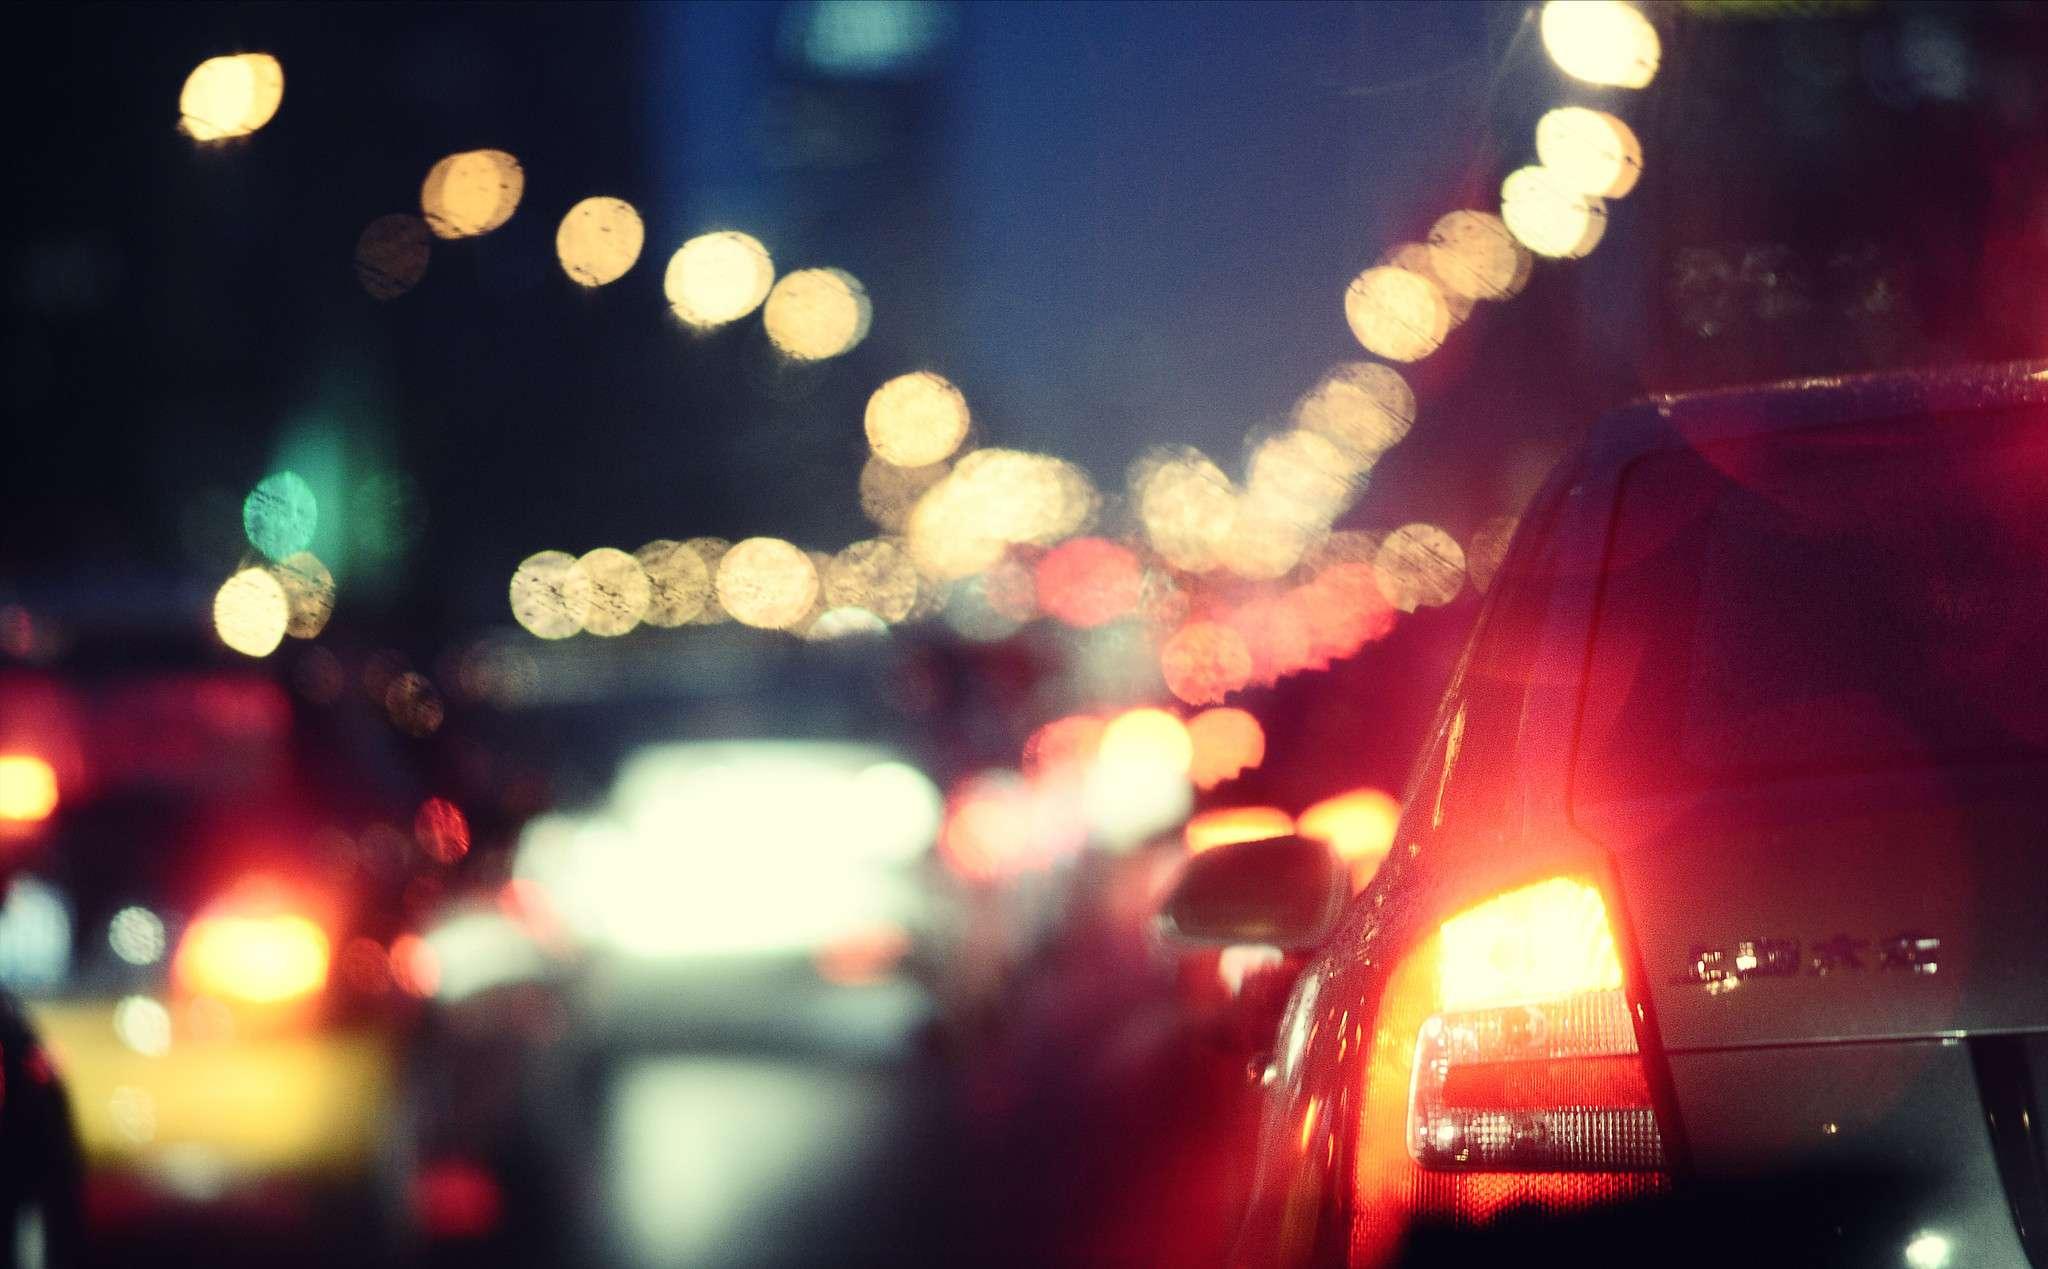 Car at night traffic